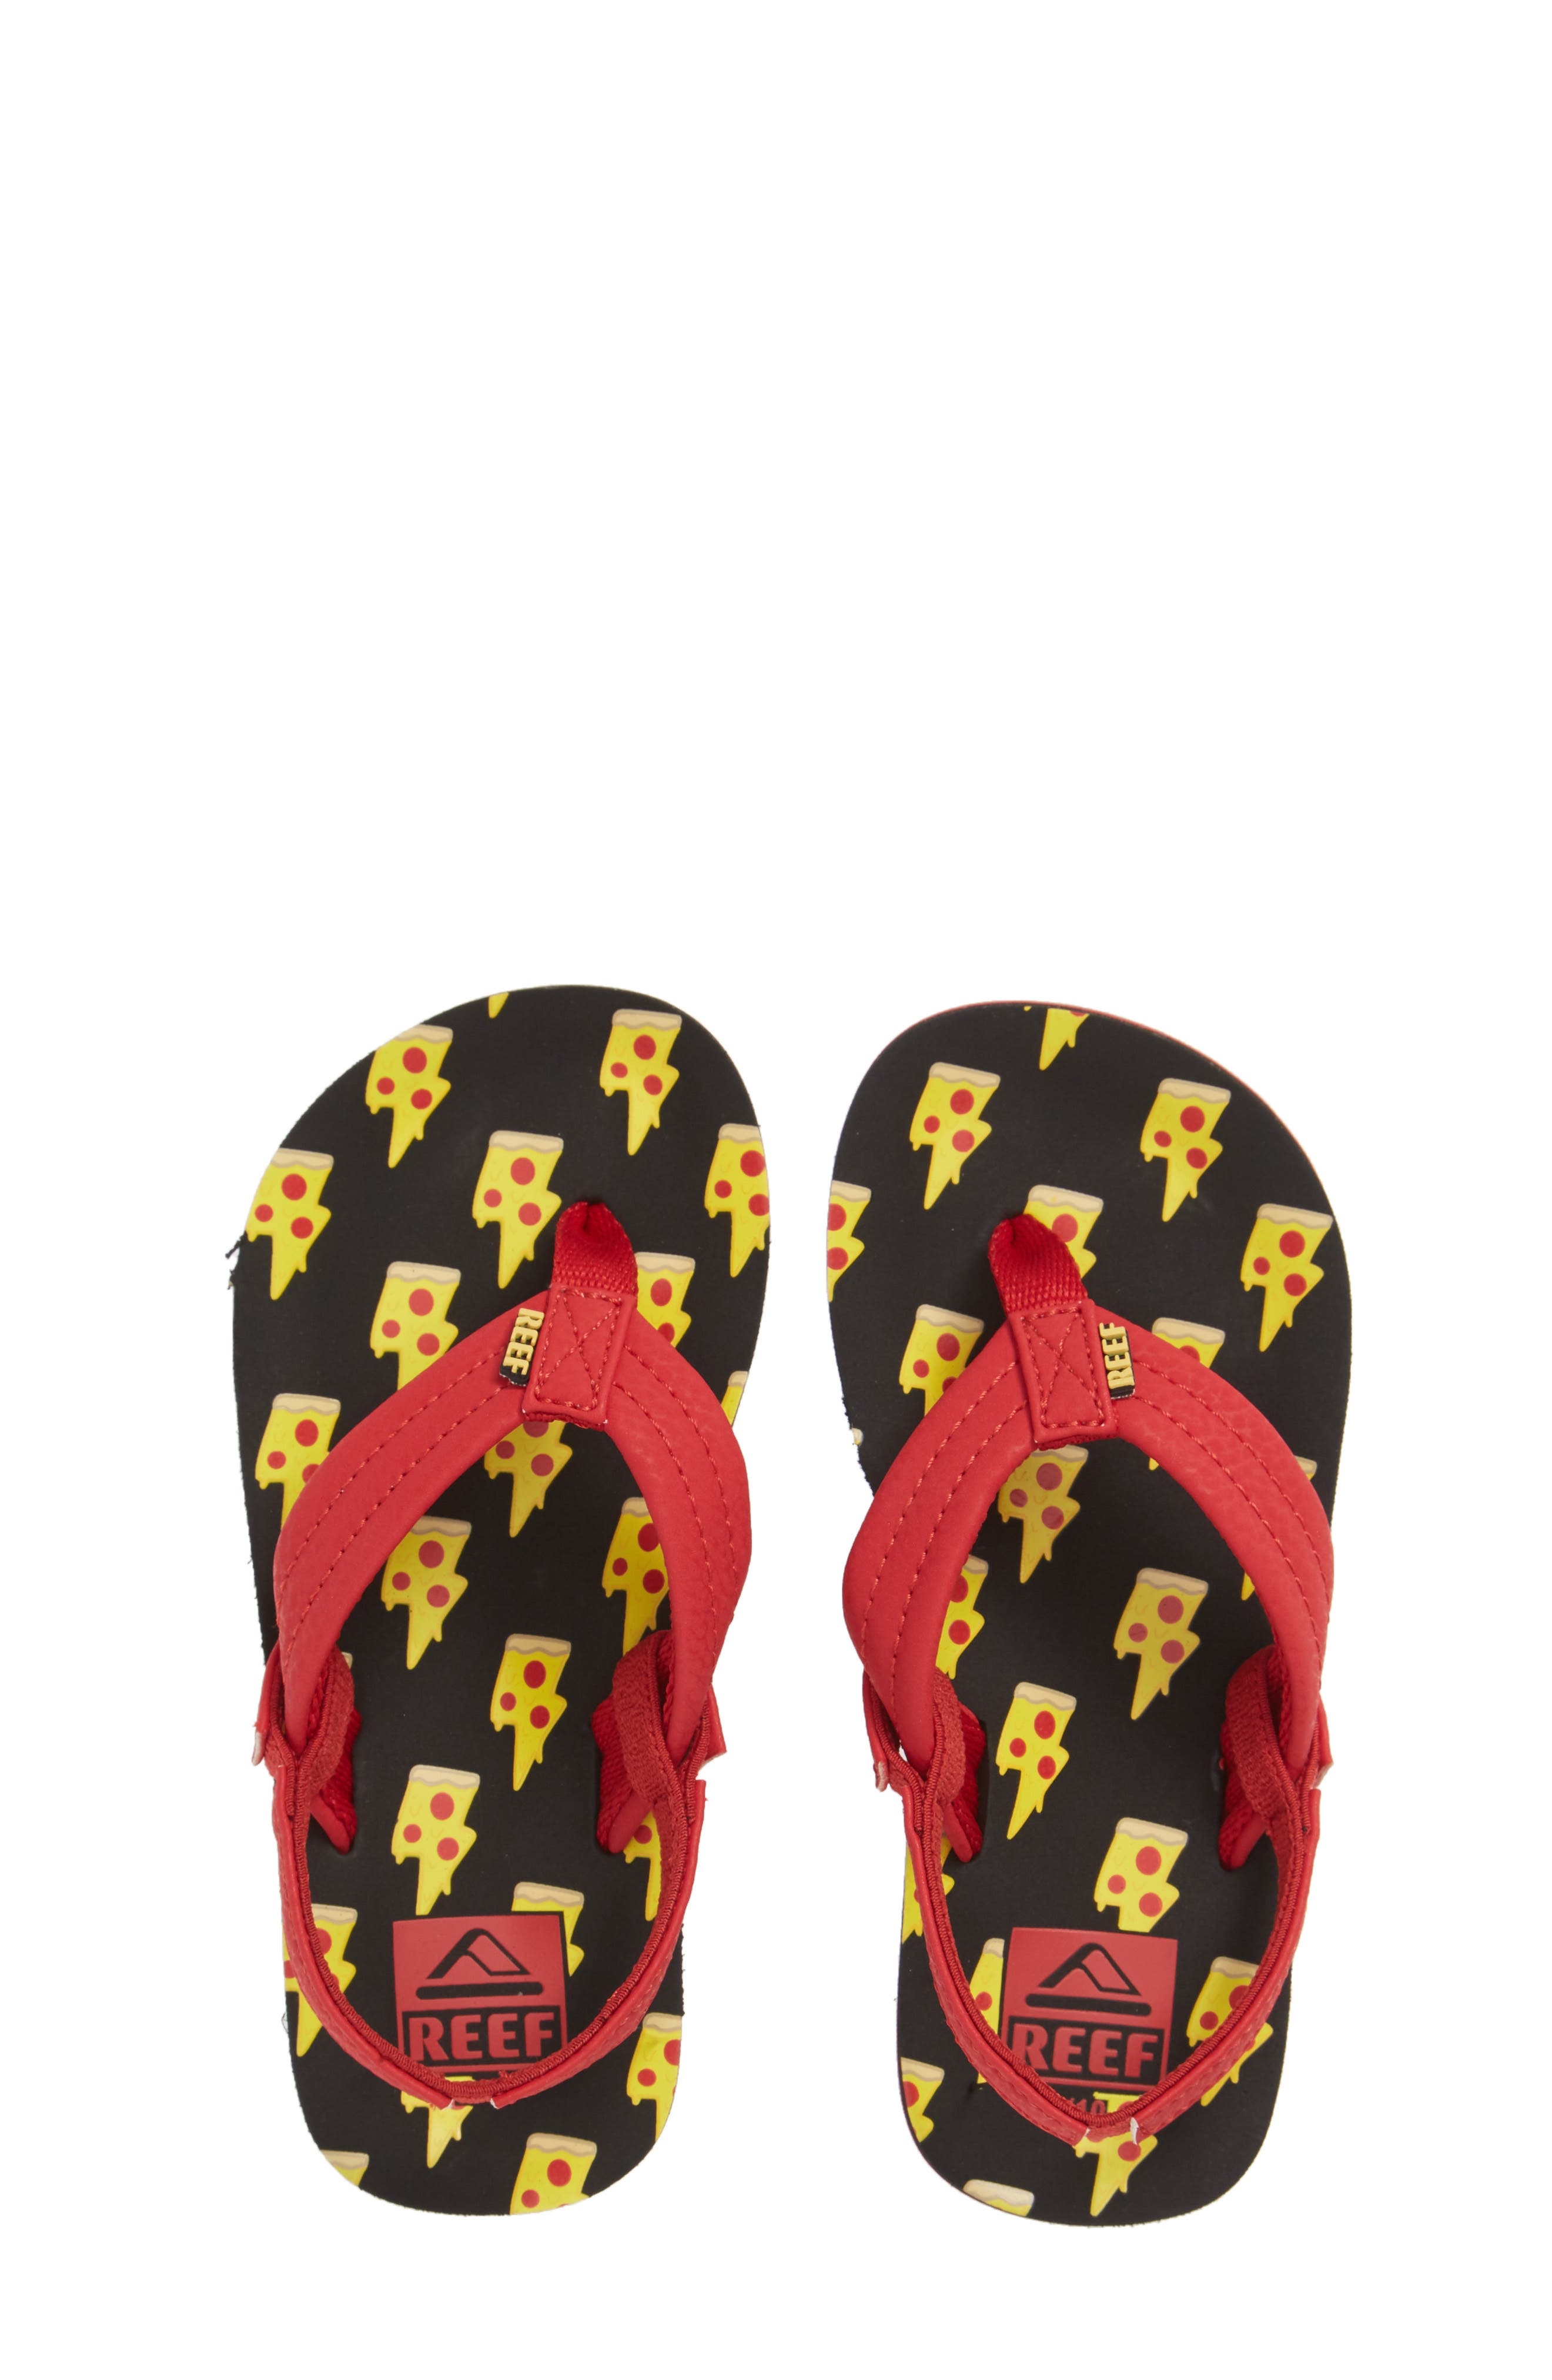 4ec452c14bfc Reef Kids  Sandals